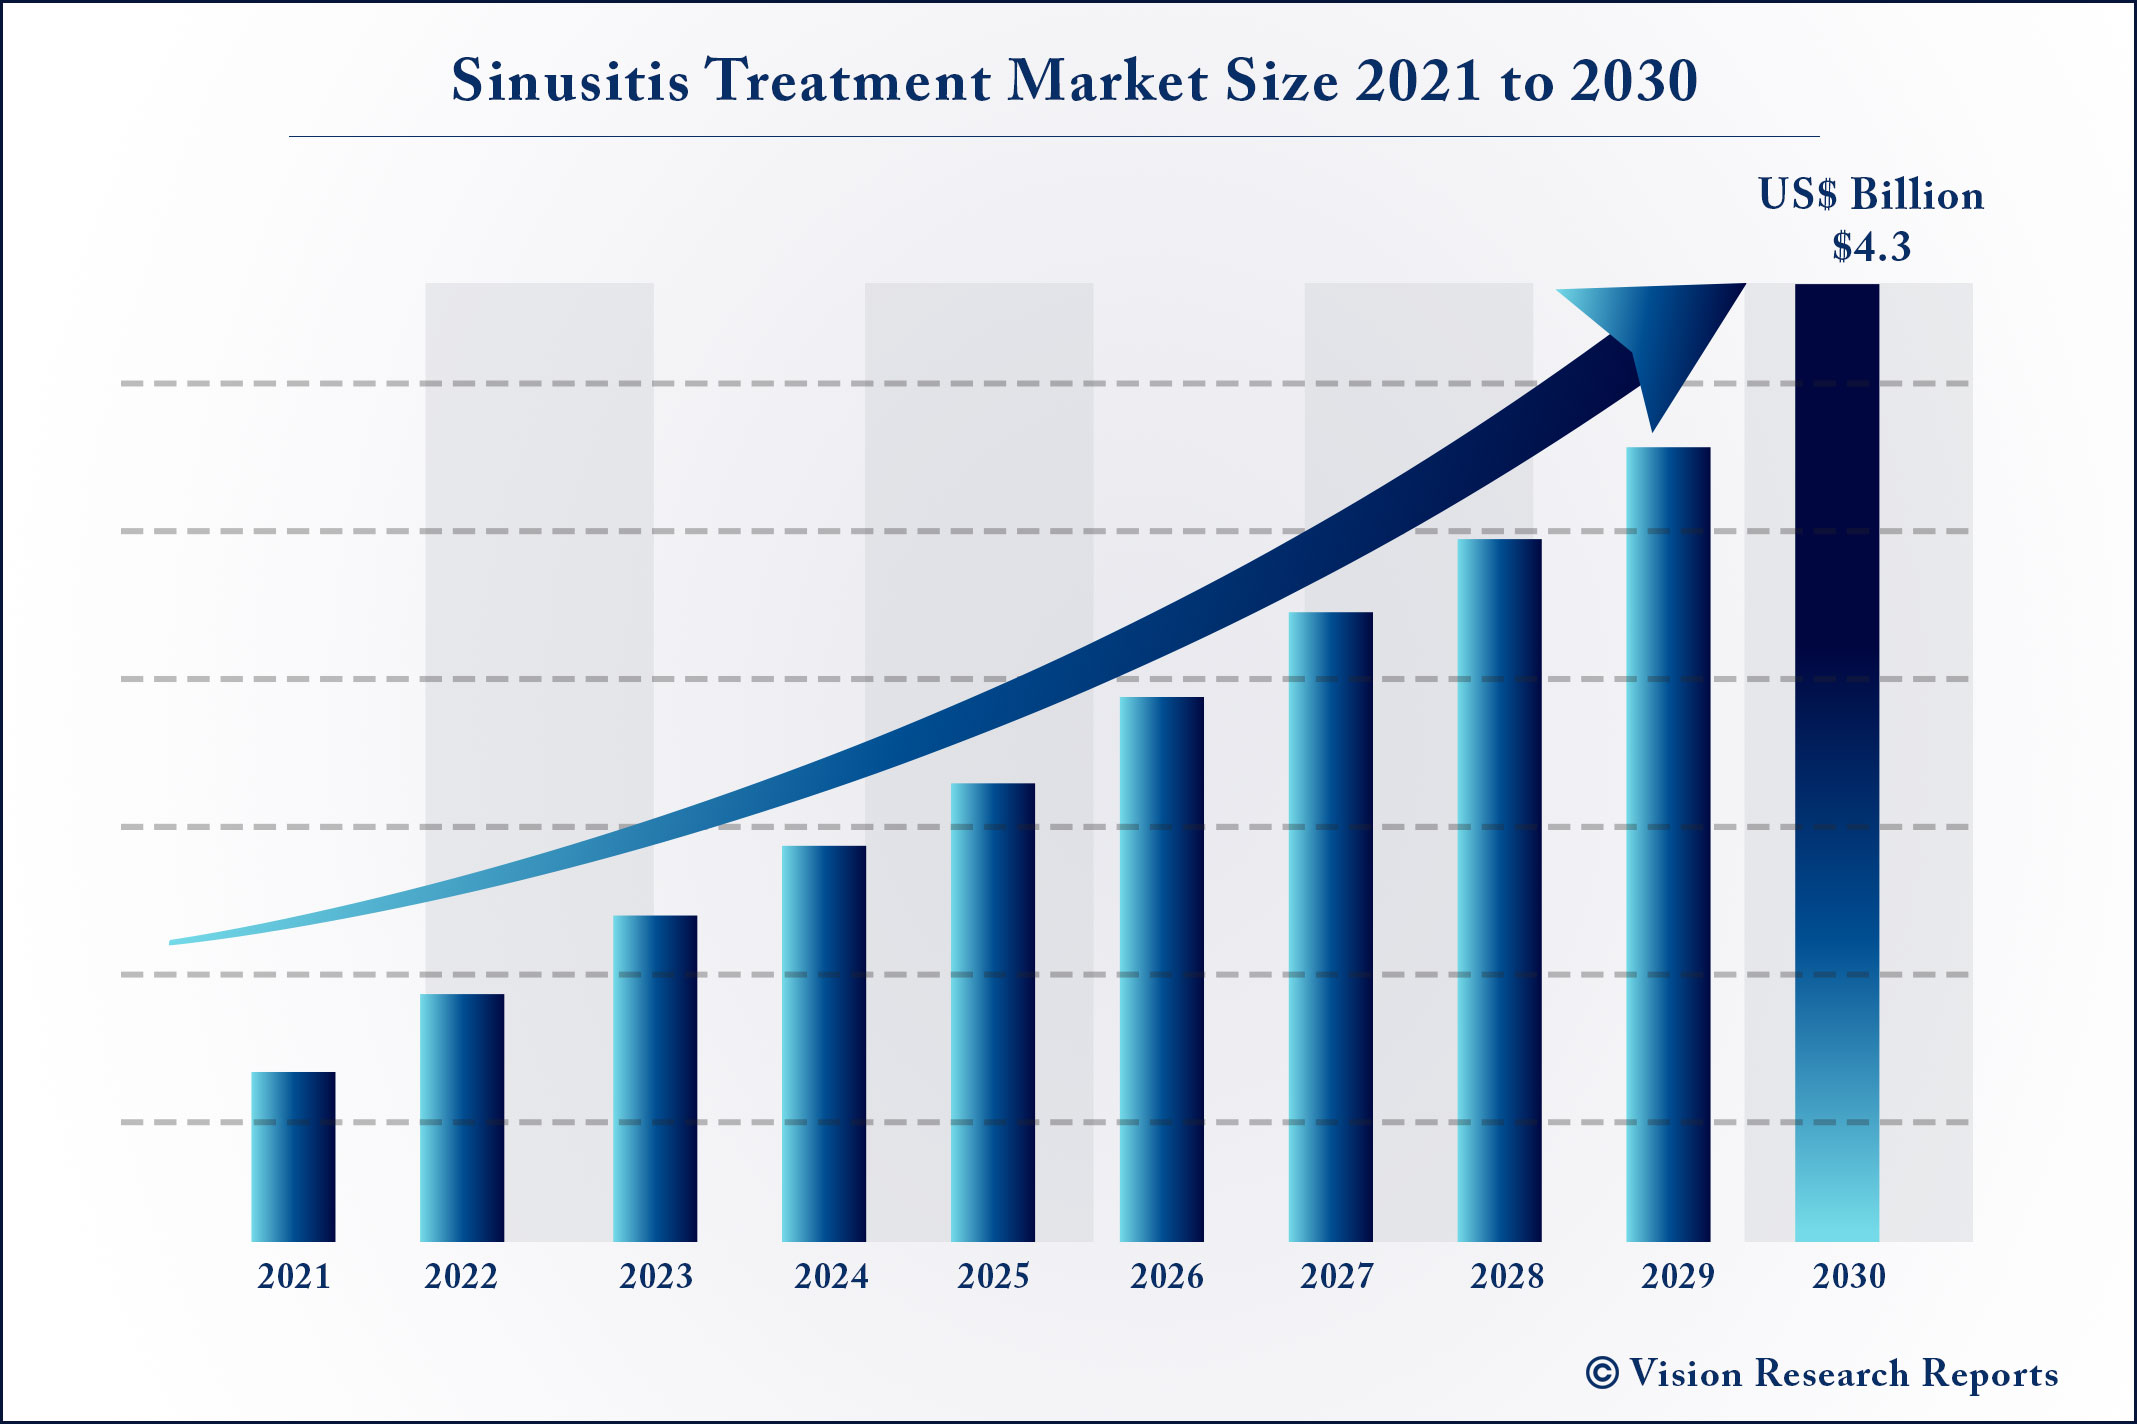 Sinusitis Treatment Market Size 2021 to 2030